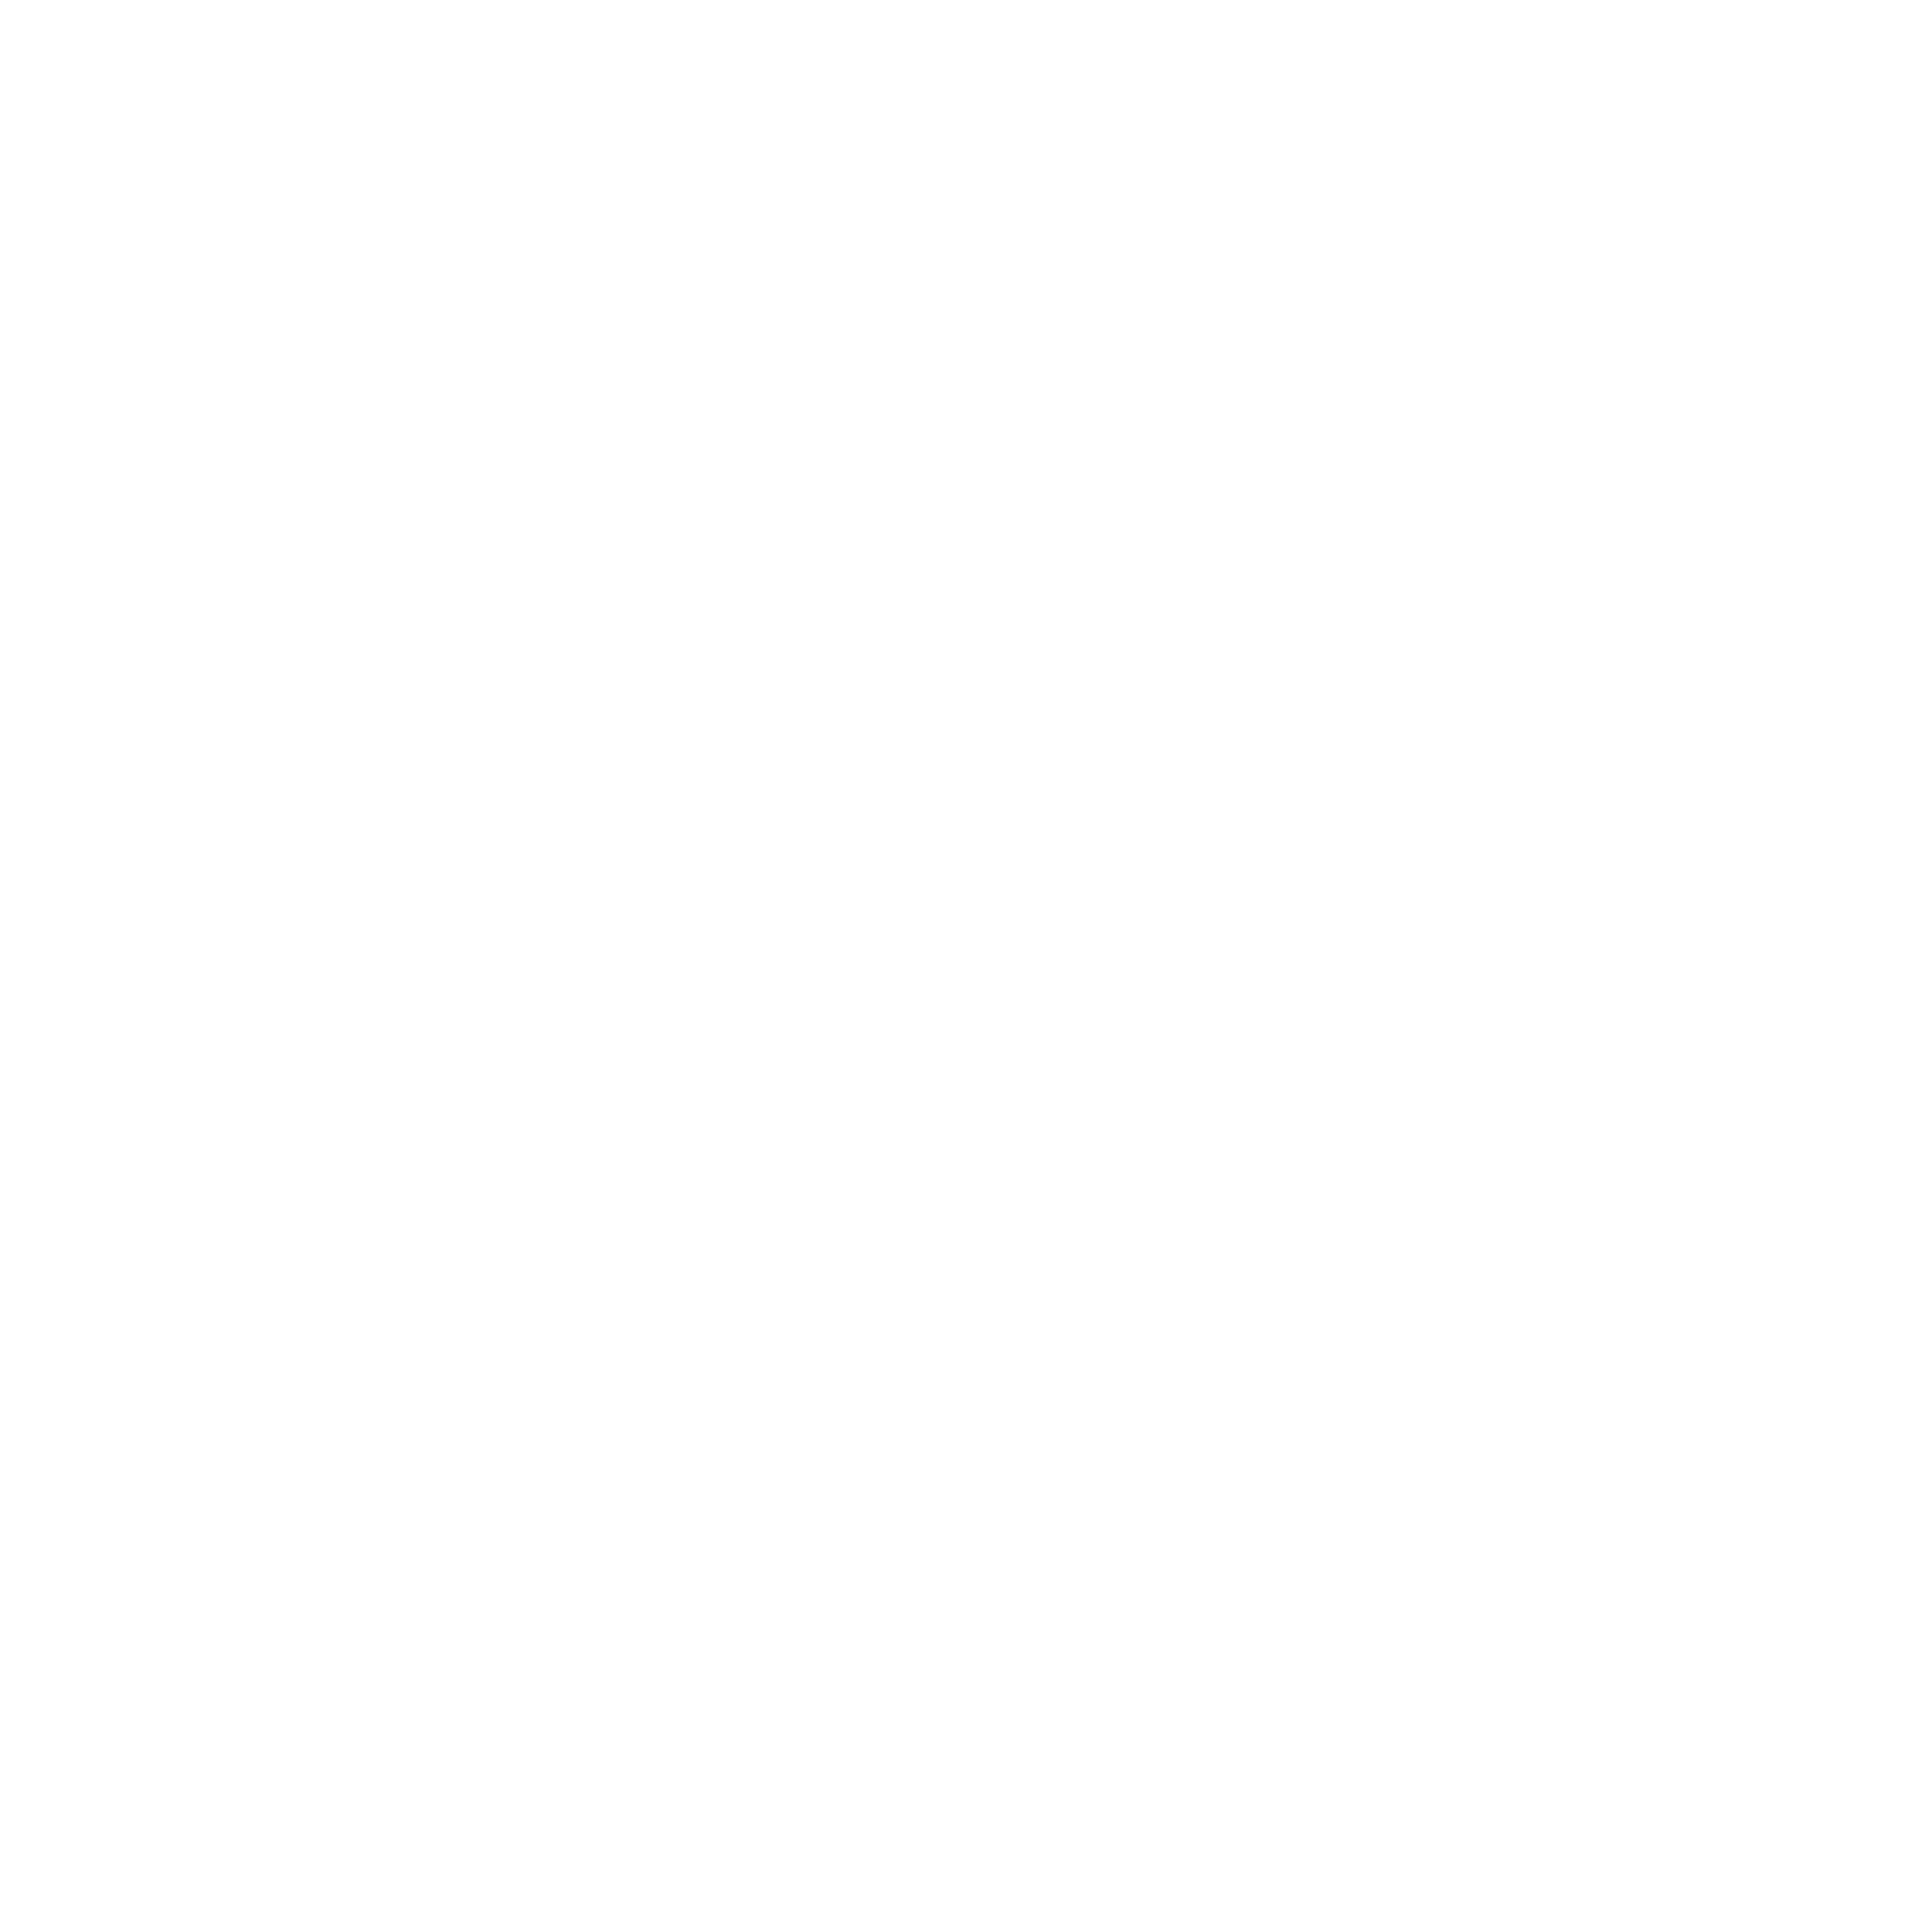 A-63A